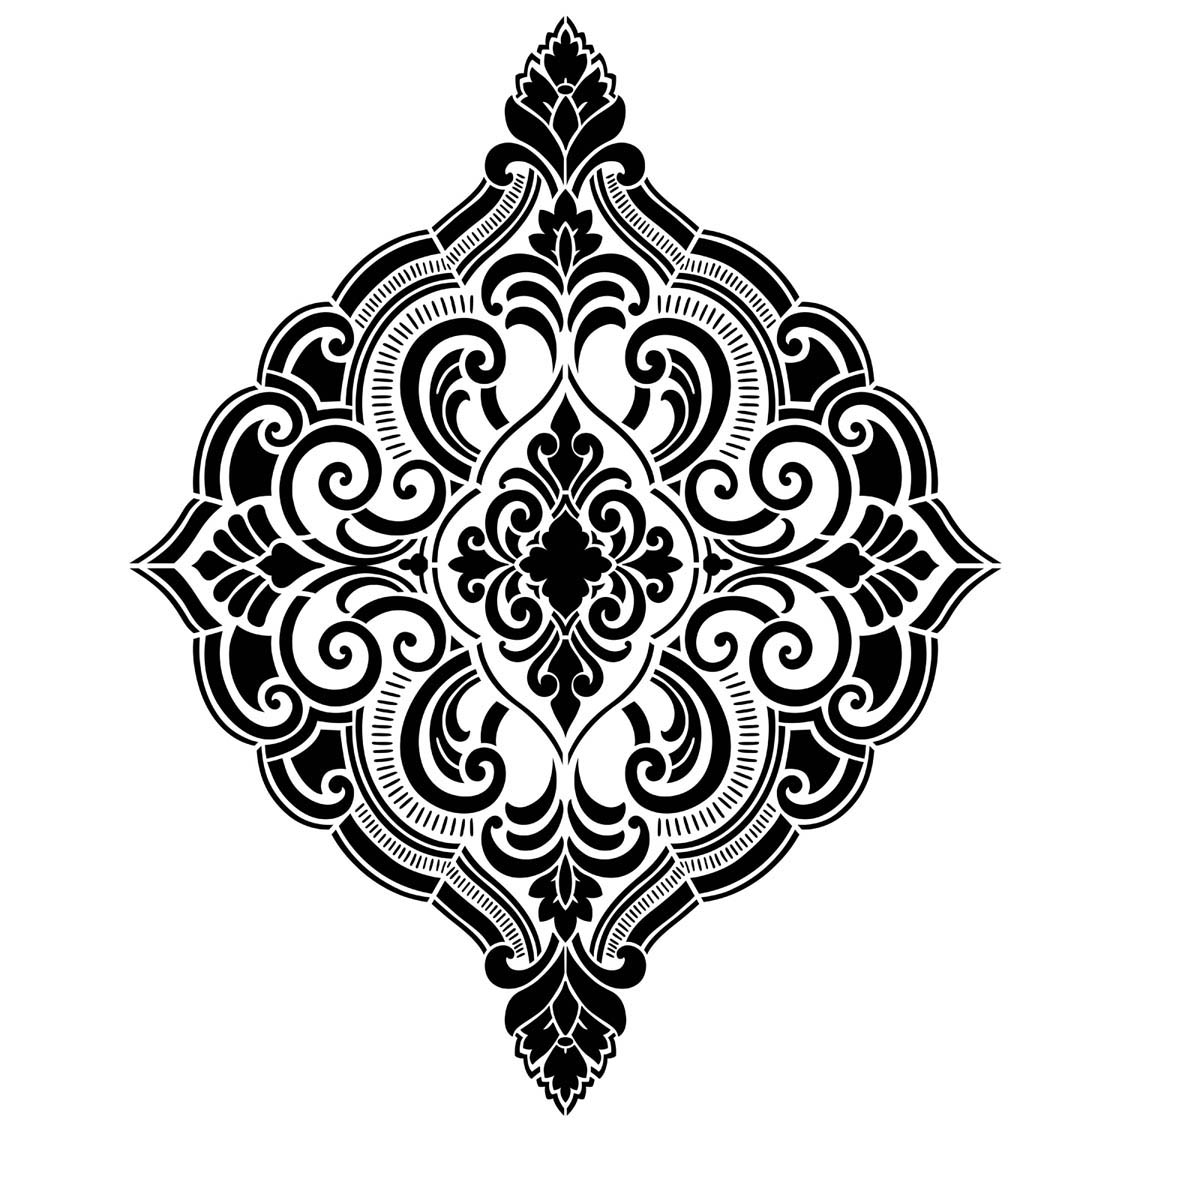 FolkArt ® Painting Stencils - Wall, Floor & Furniture - Ornate Damask - 32716